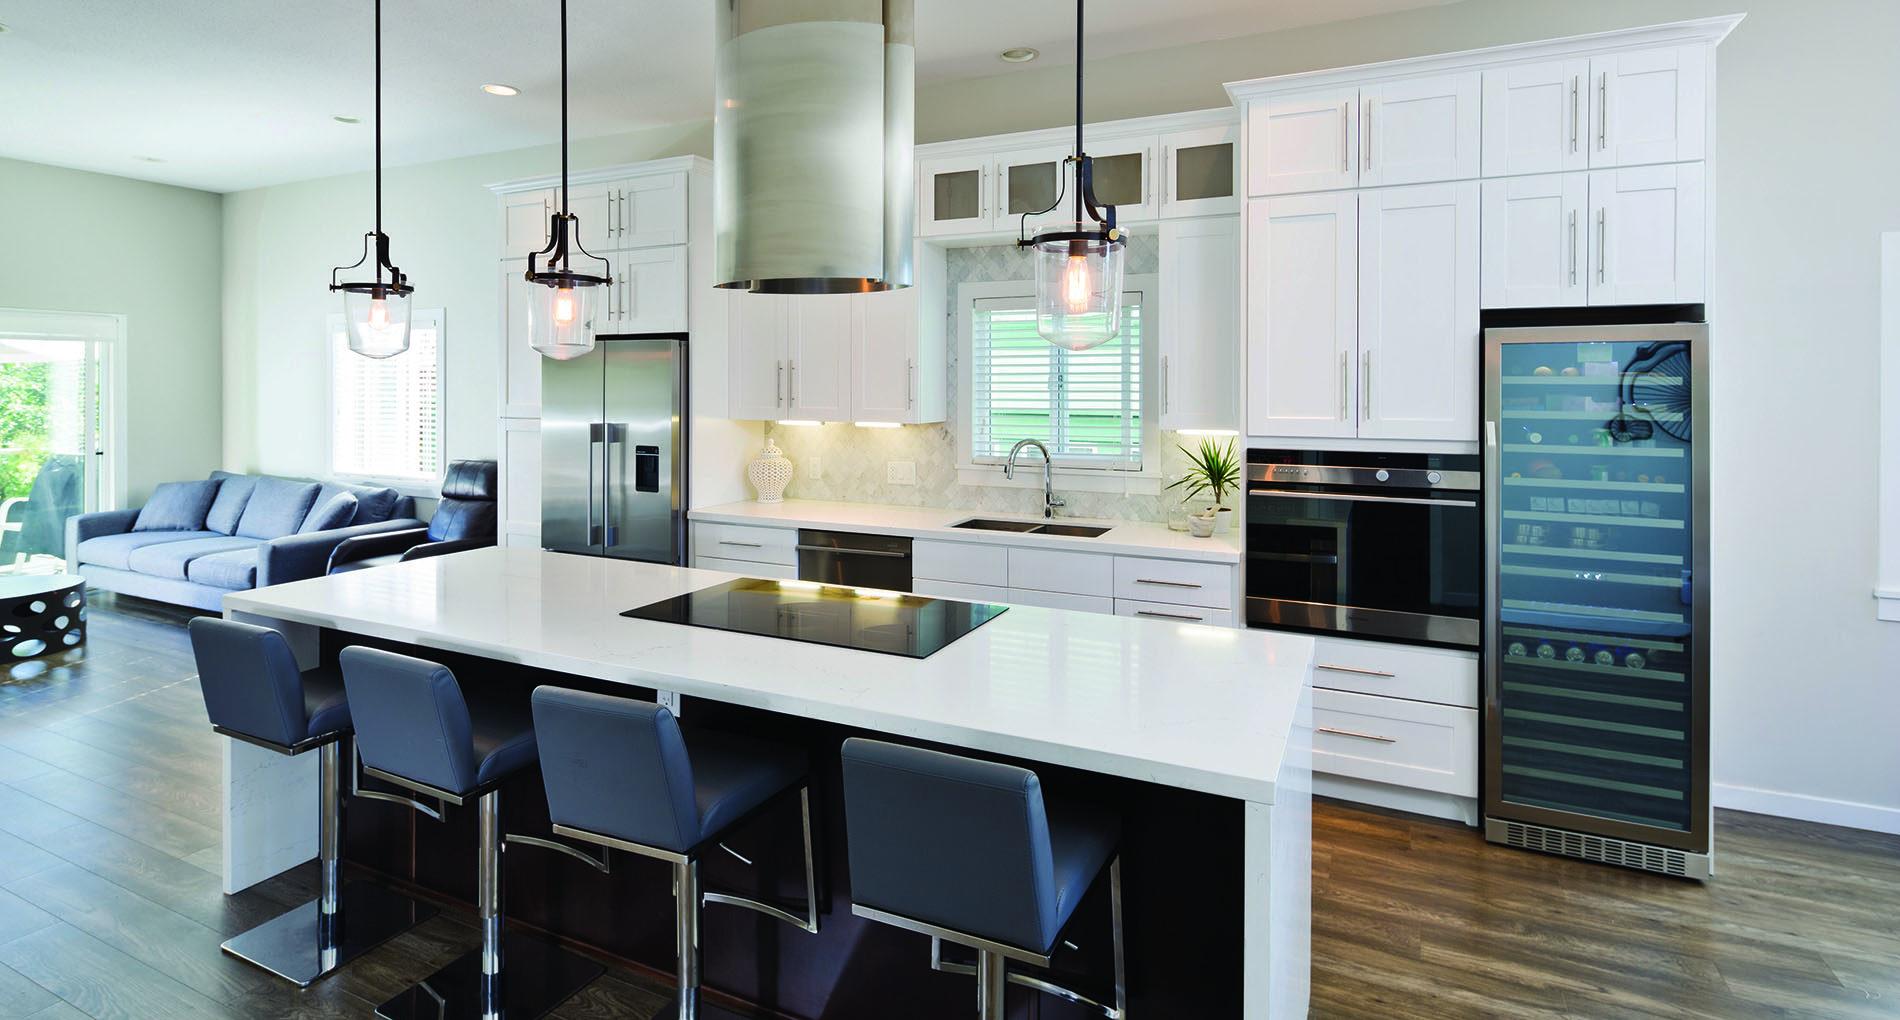 Kitchen Renovations Amp Custom Design In Kelowna Alair